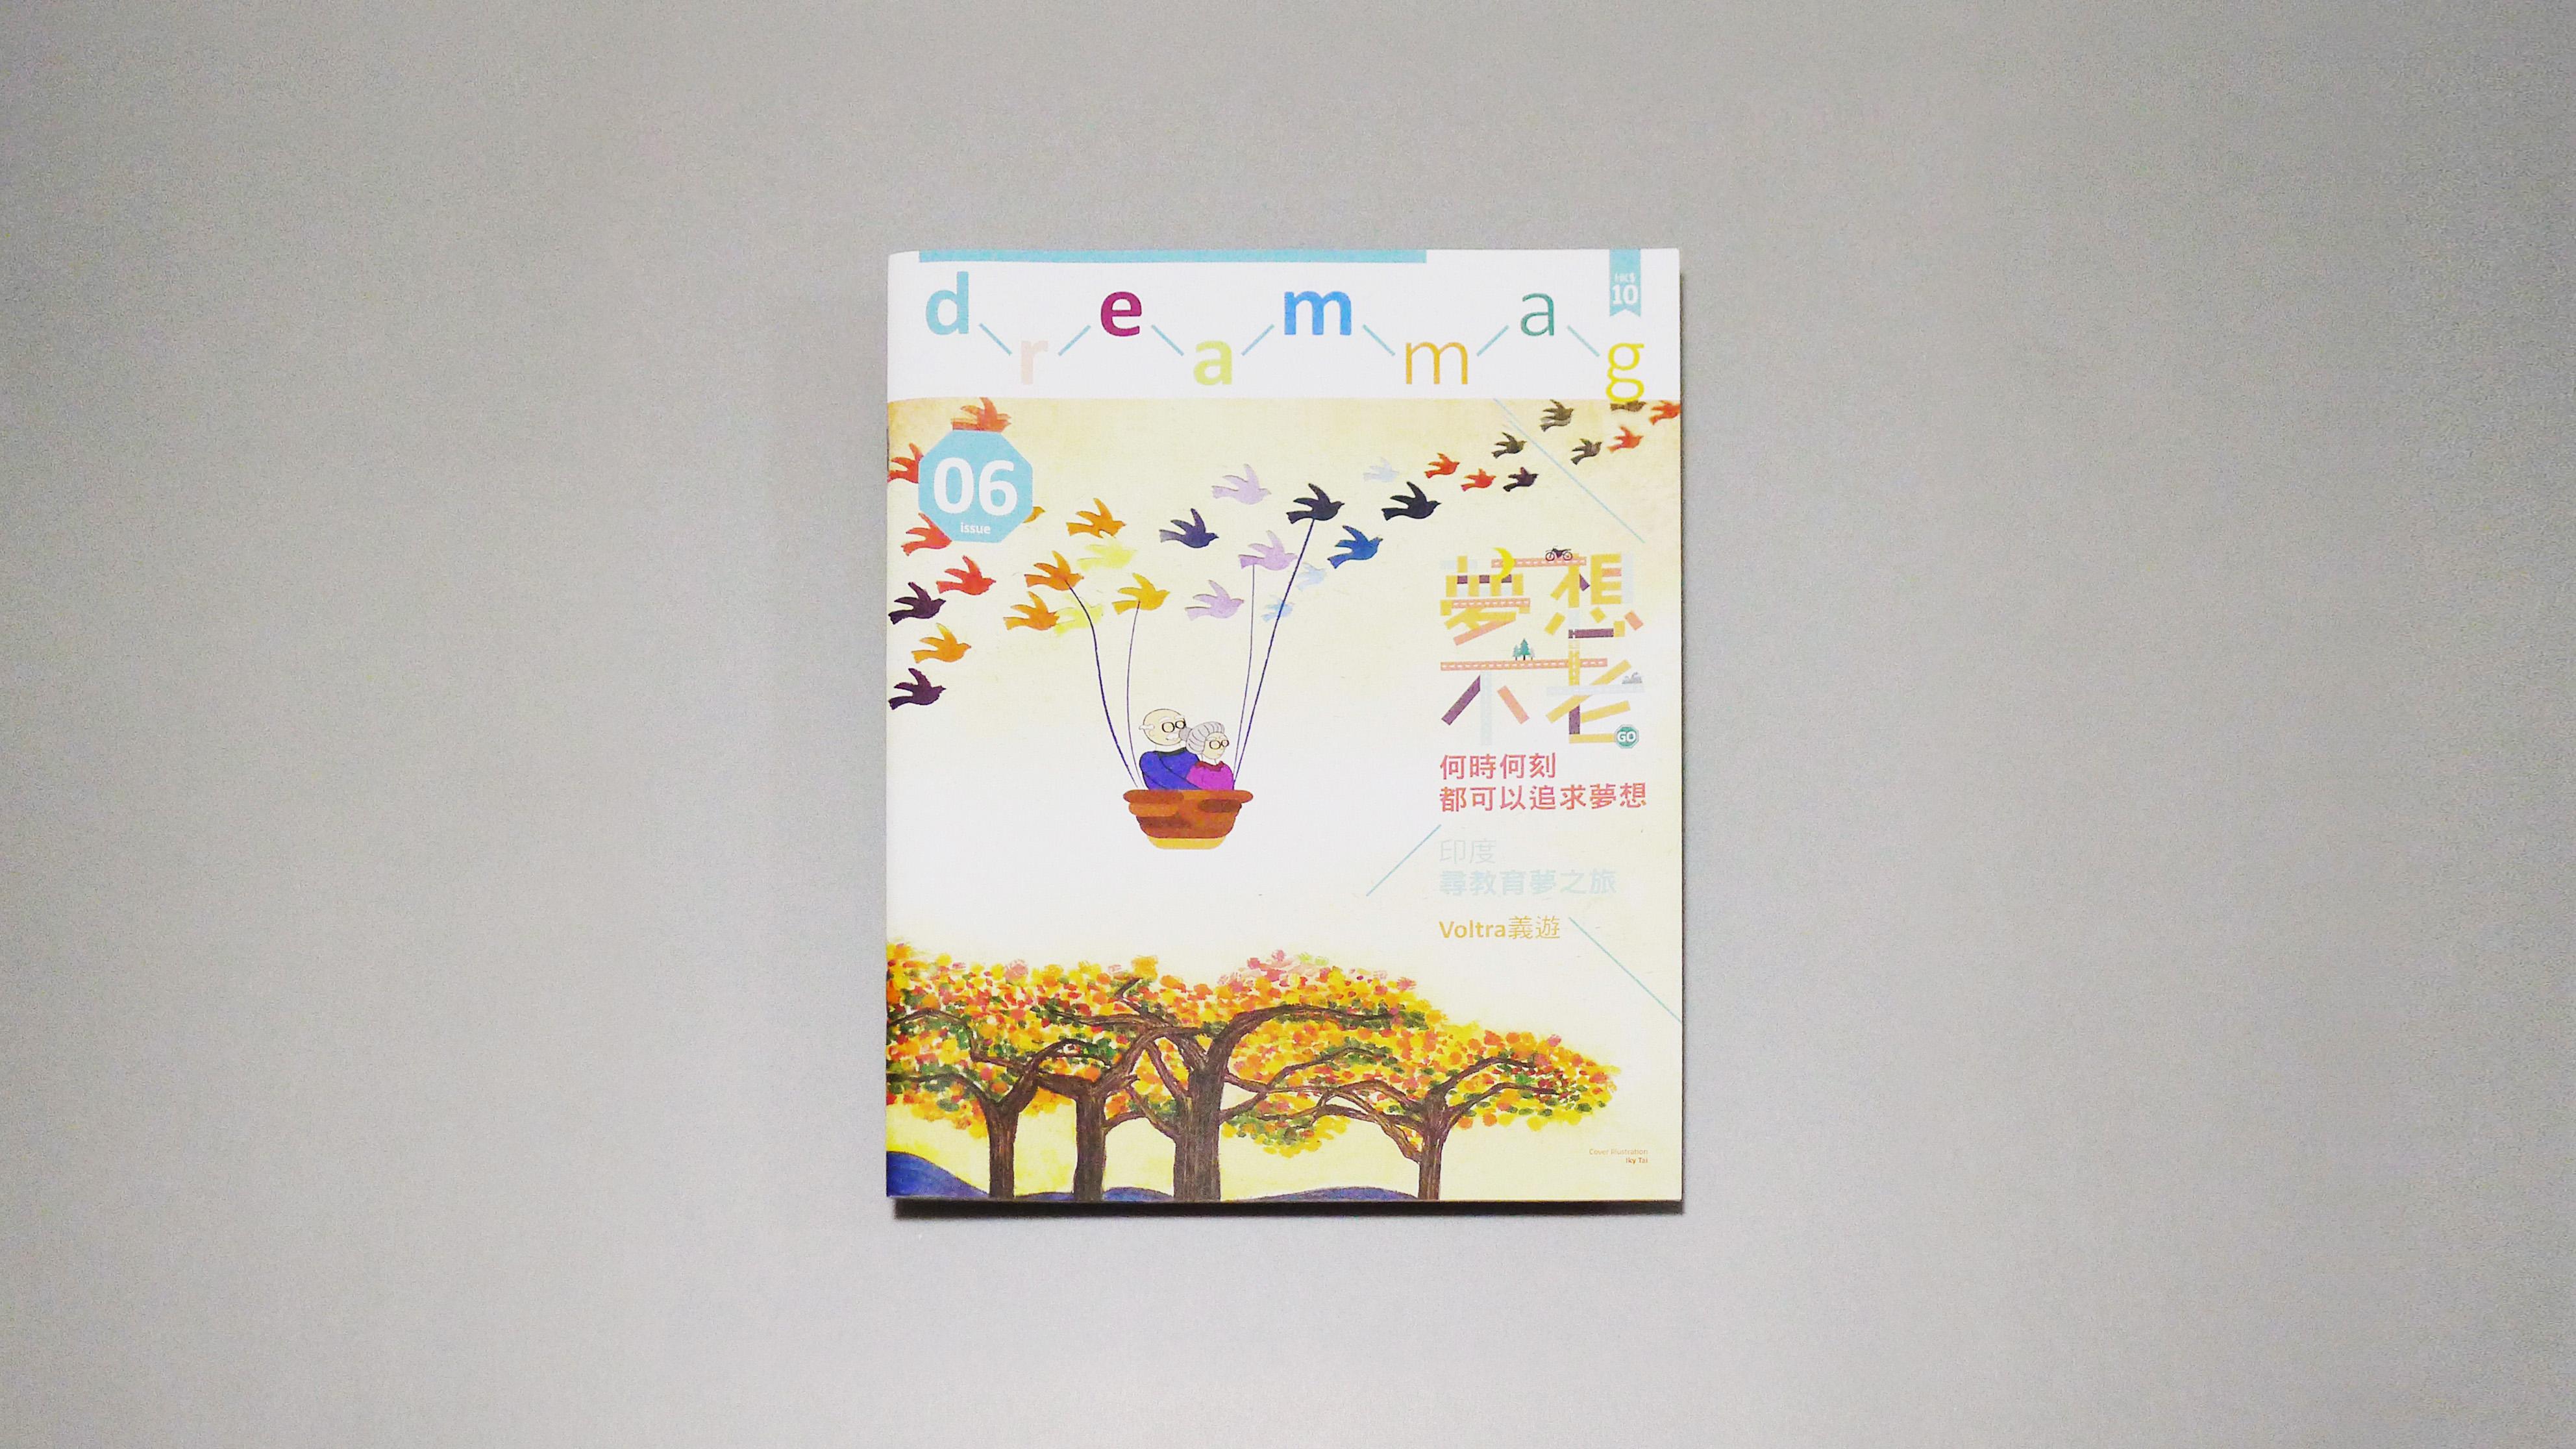 DreamMag_Cover.jpg